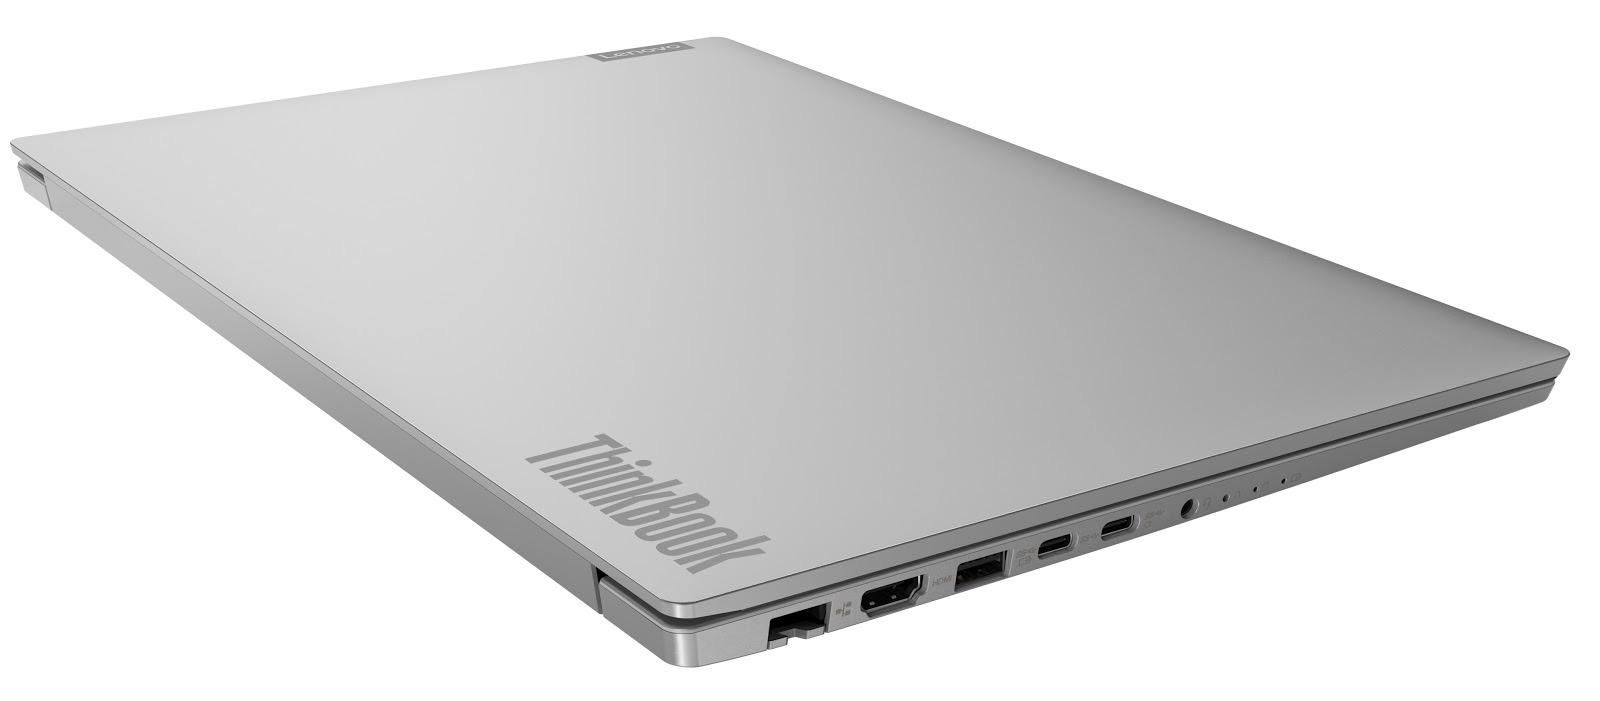 Фото 3. Ноутбук Lenovo ThinkBook 15-IIL (20SM007ERU)